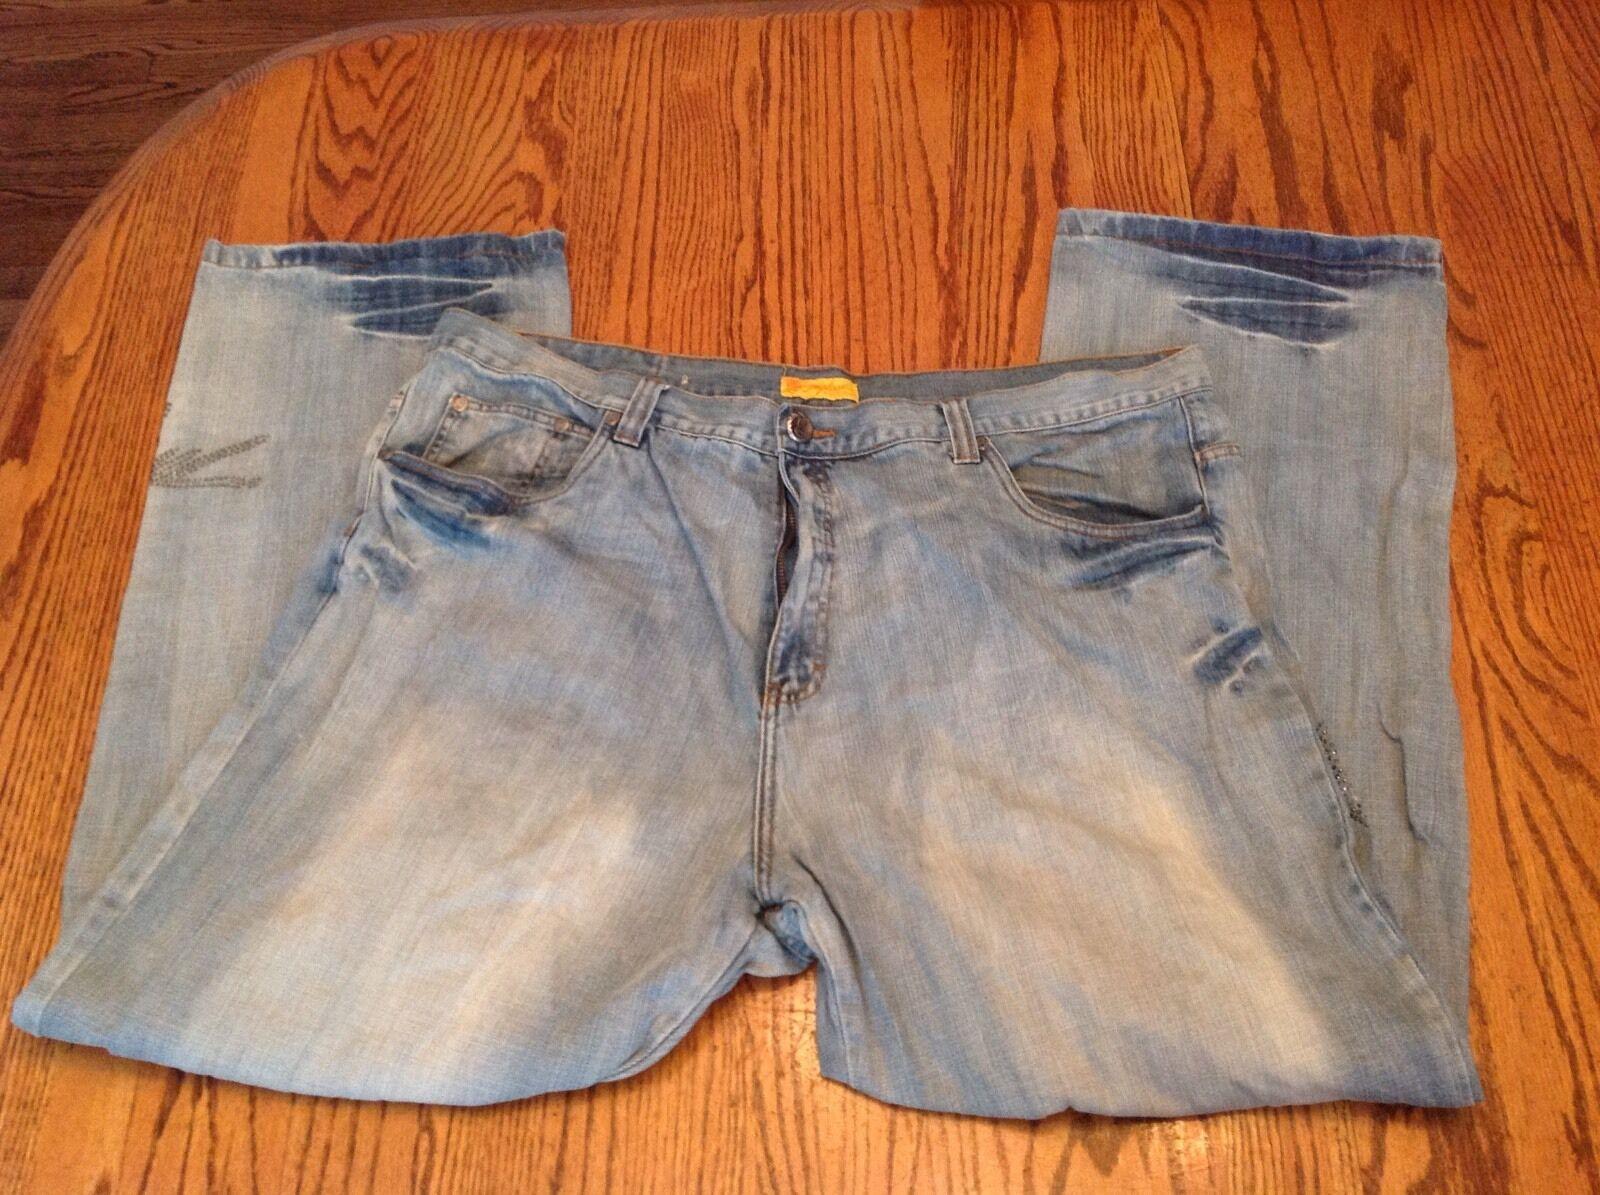 Miskeen Big Men Denim bluee Jeans Light Wash Size 44 32